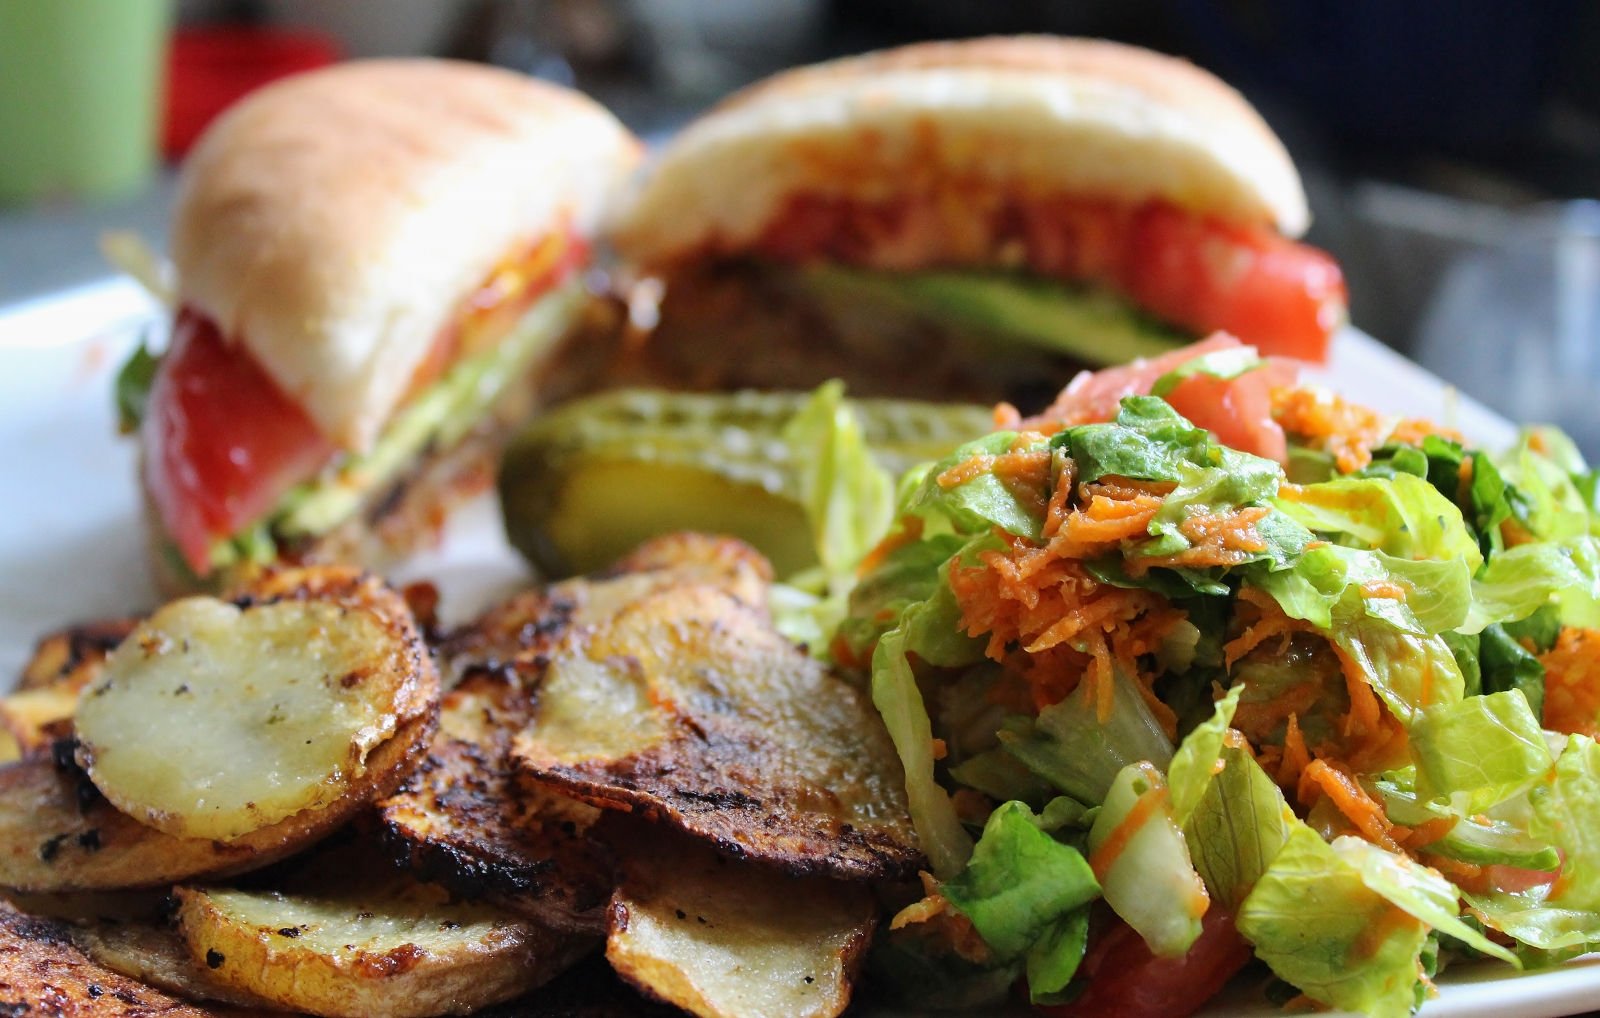 veggie burger patates salade vegan (1600x1018)